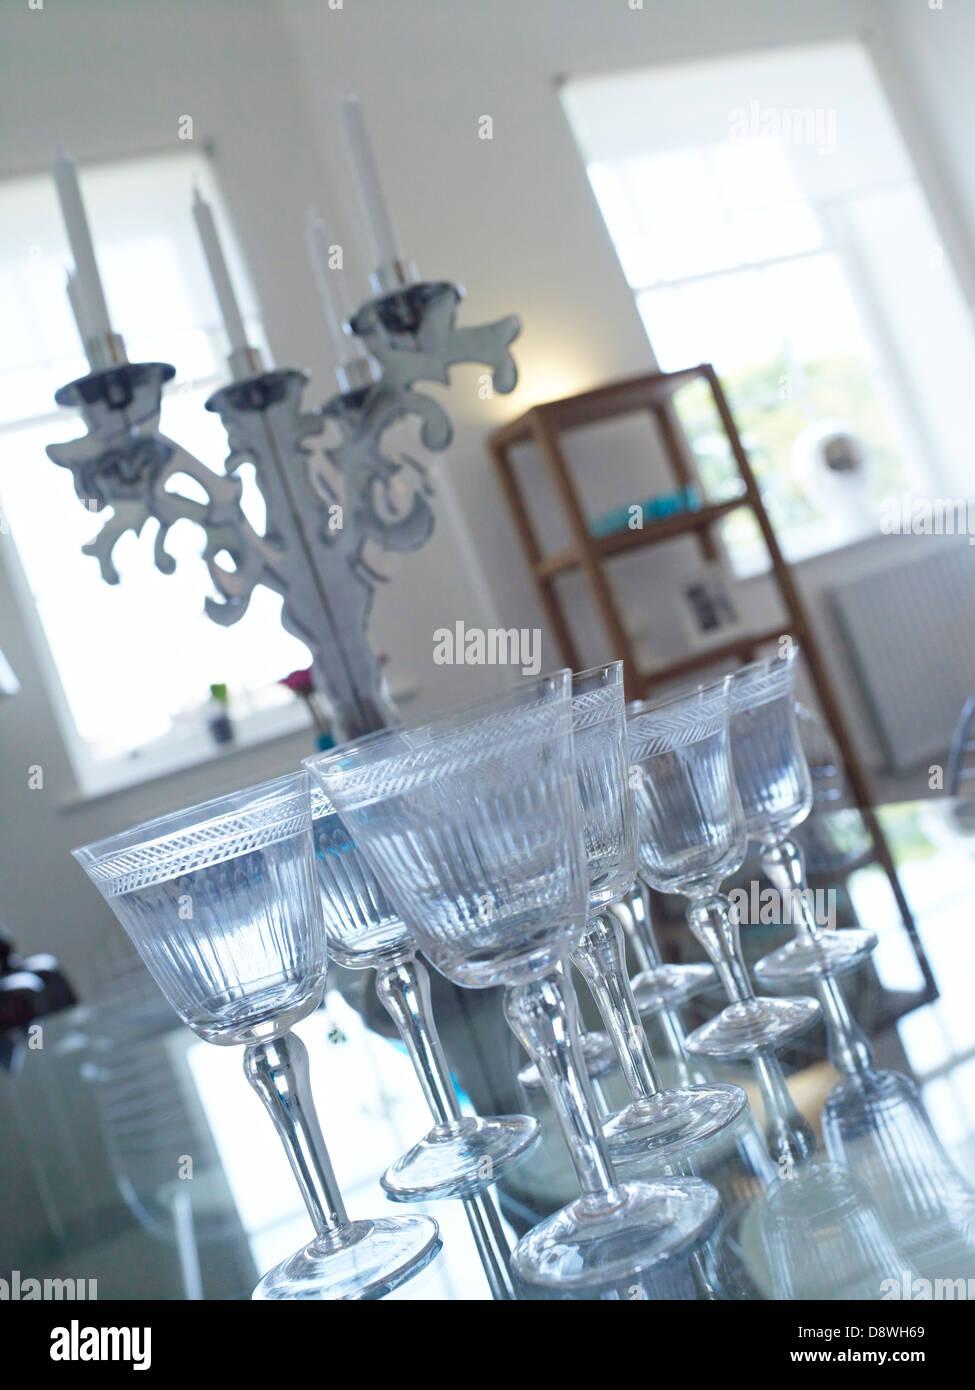 Copas de vino mesa de comedor Imagen De Stock